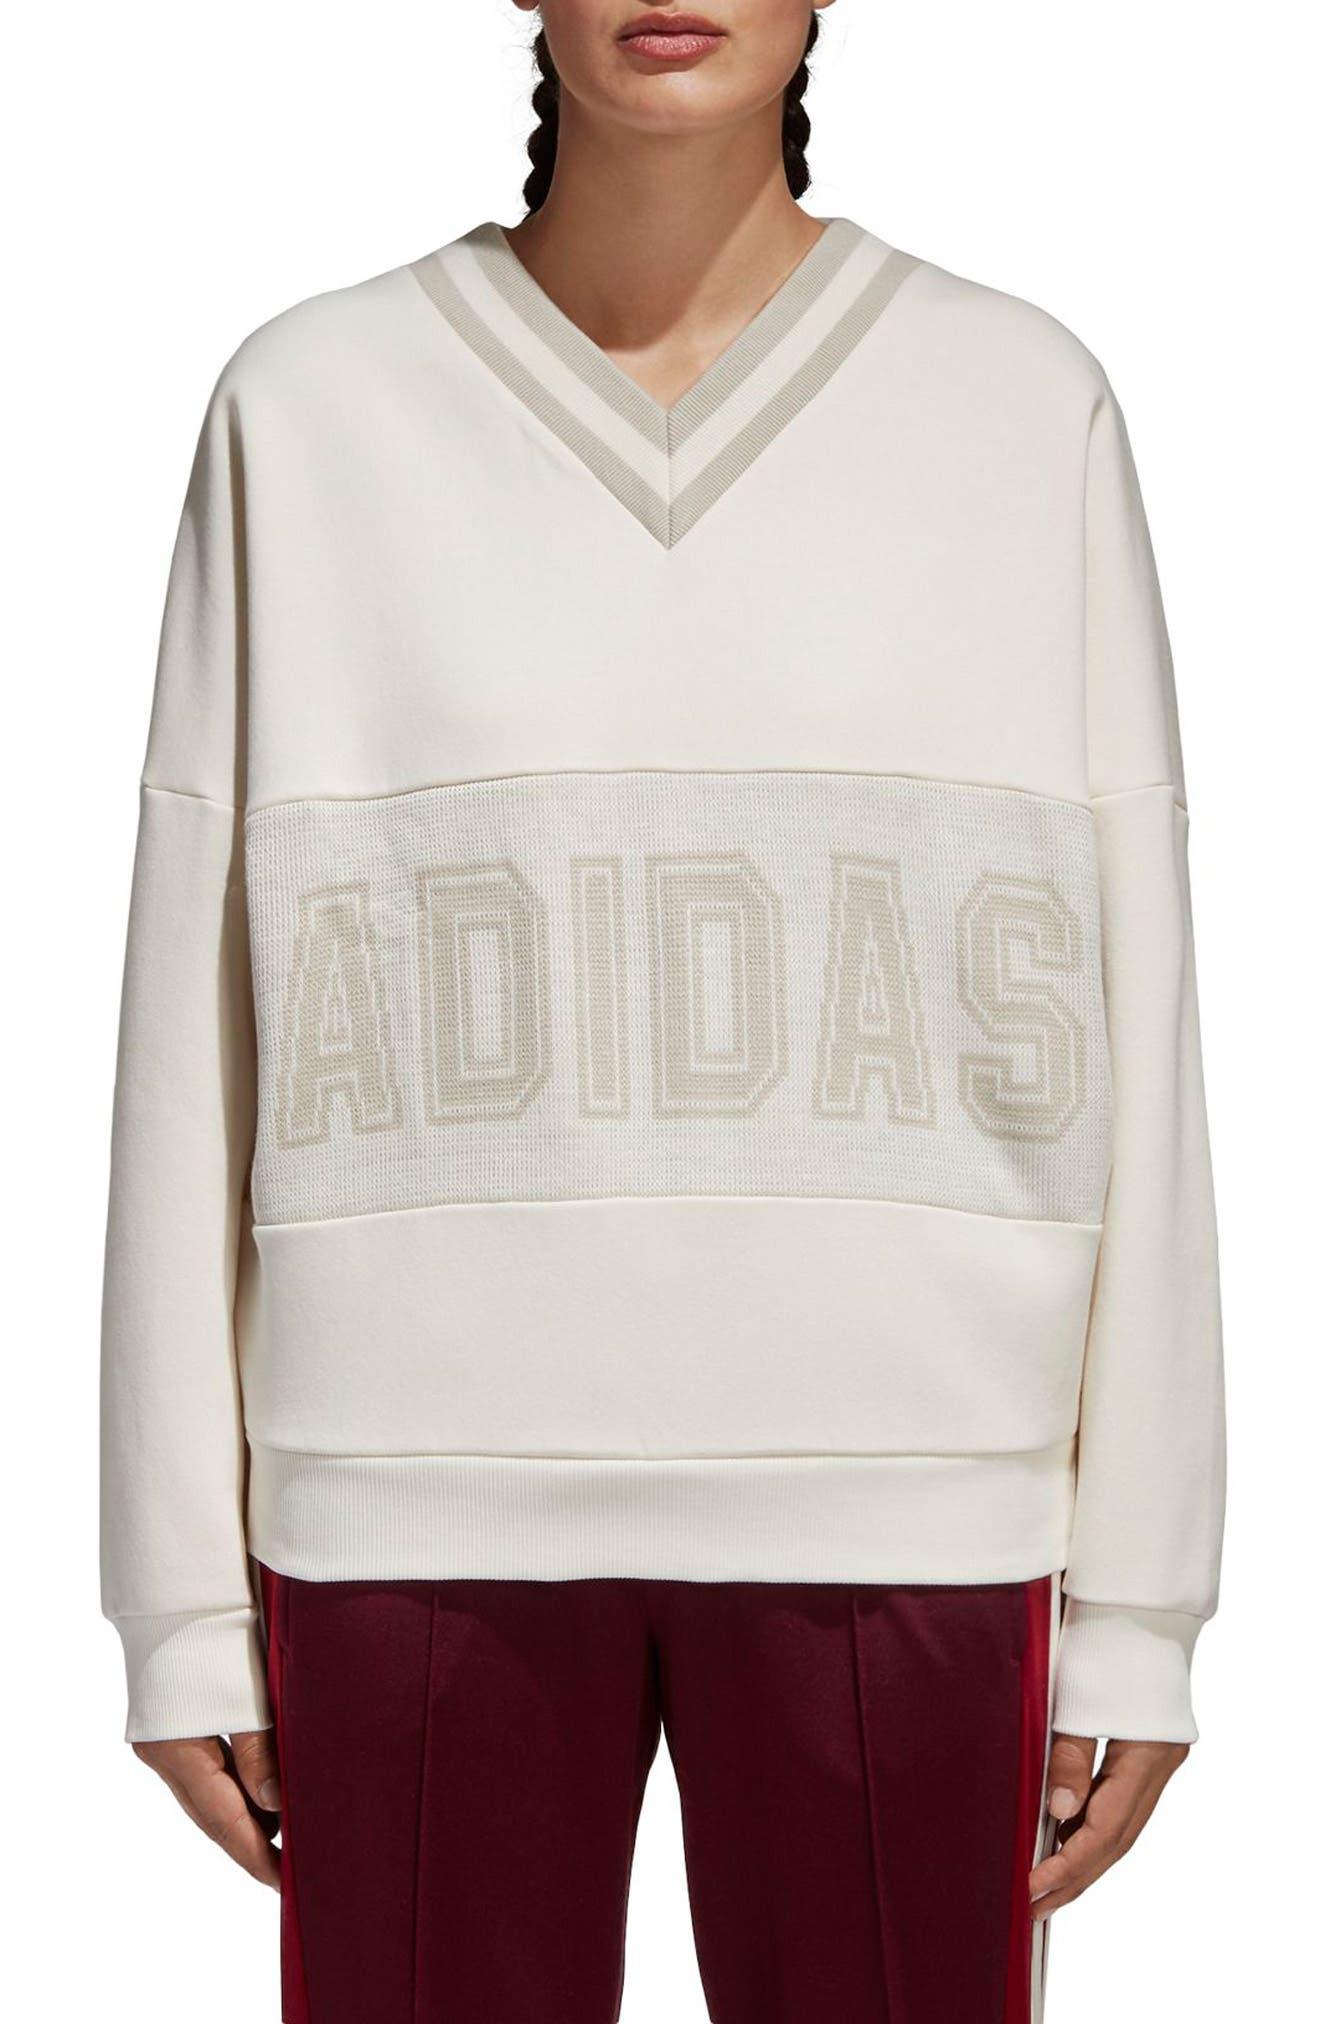 Originals Adibreak Sweatshirt,                         Main,                         color, Chalk White/ Chalk White